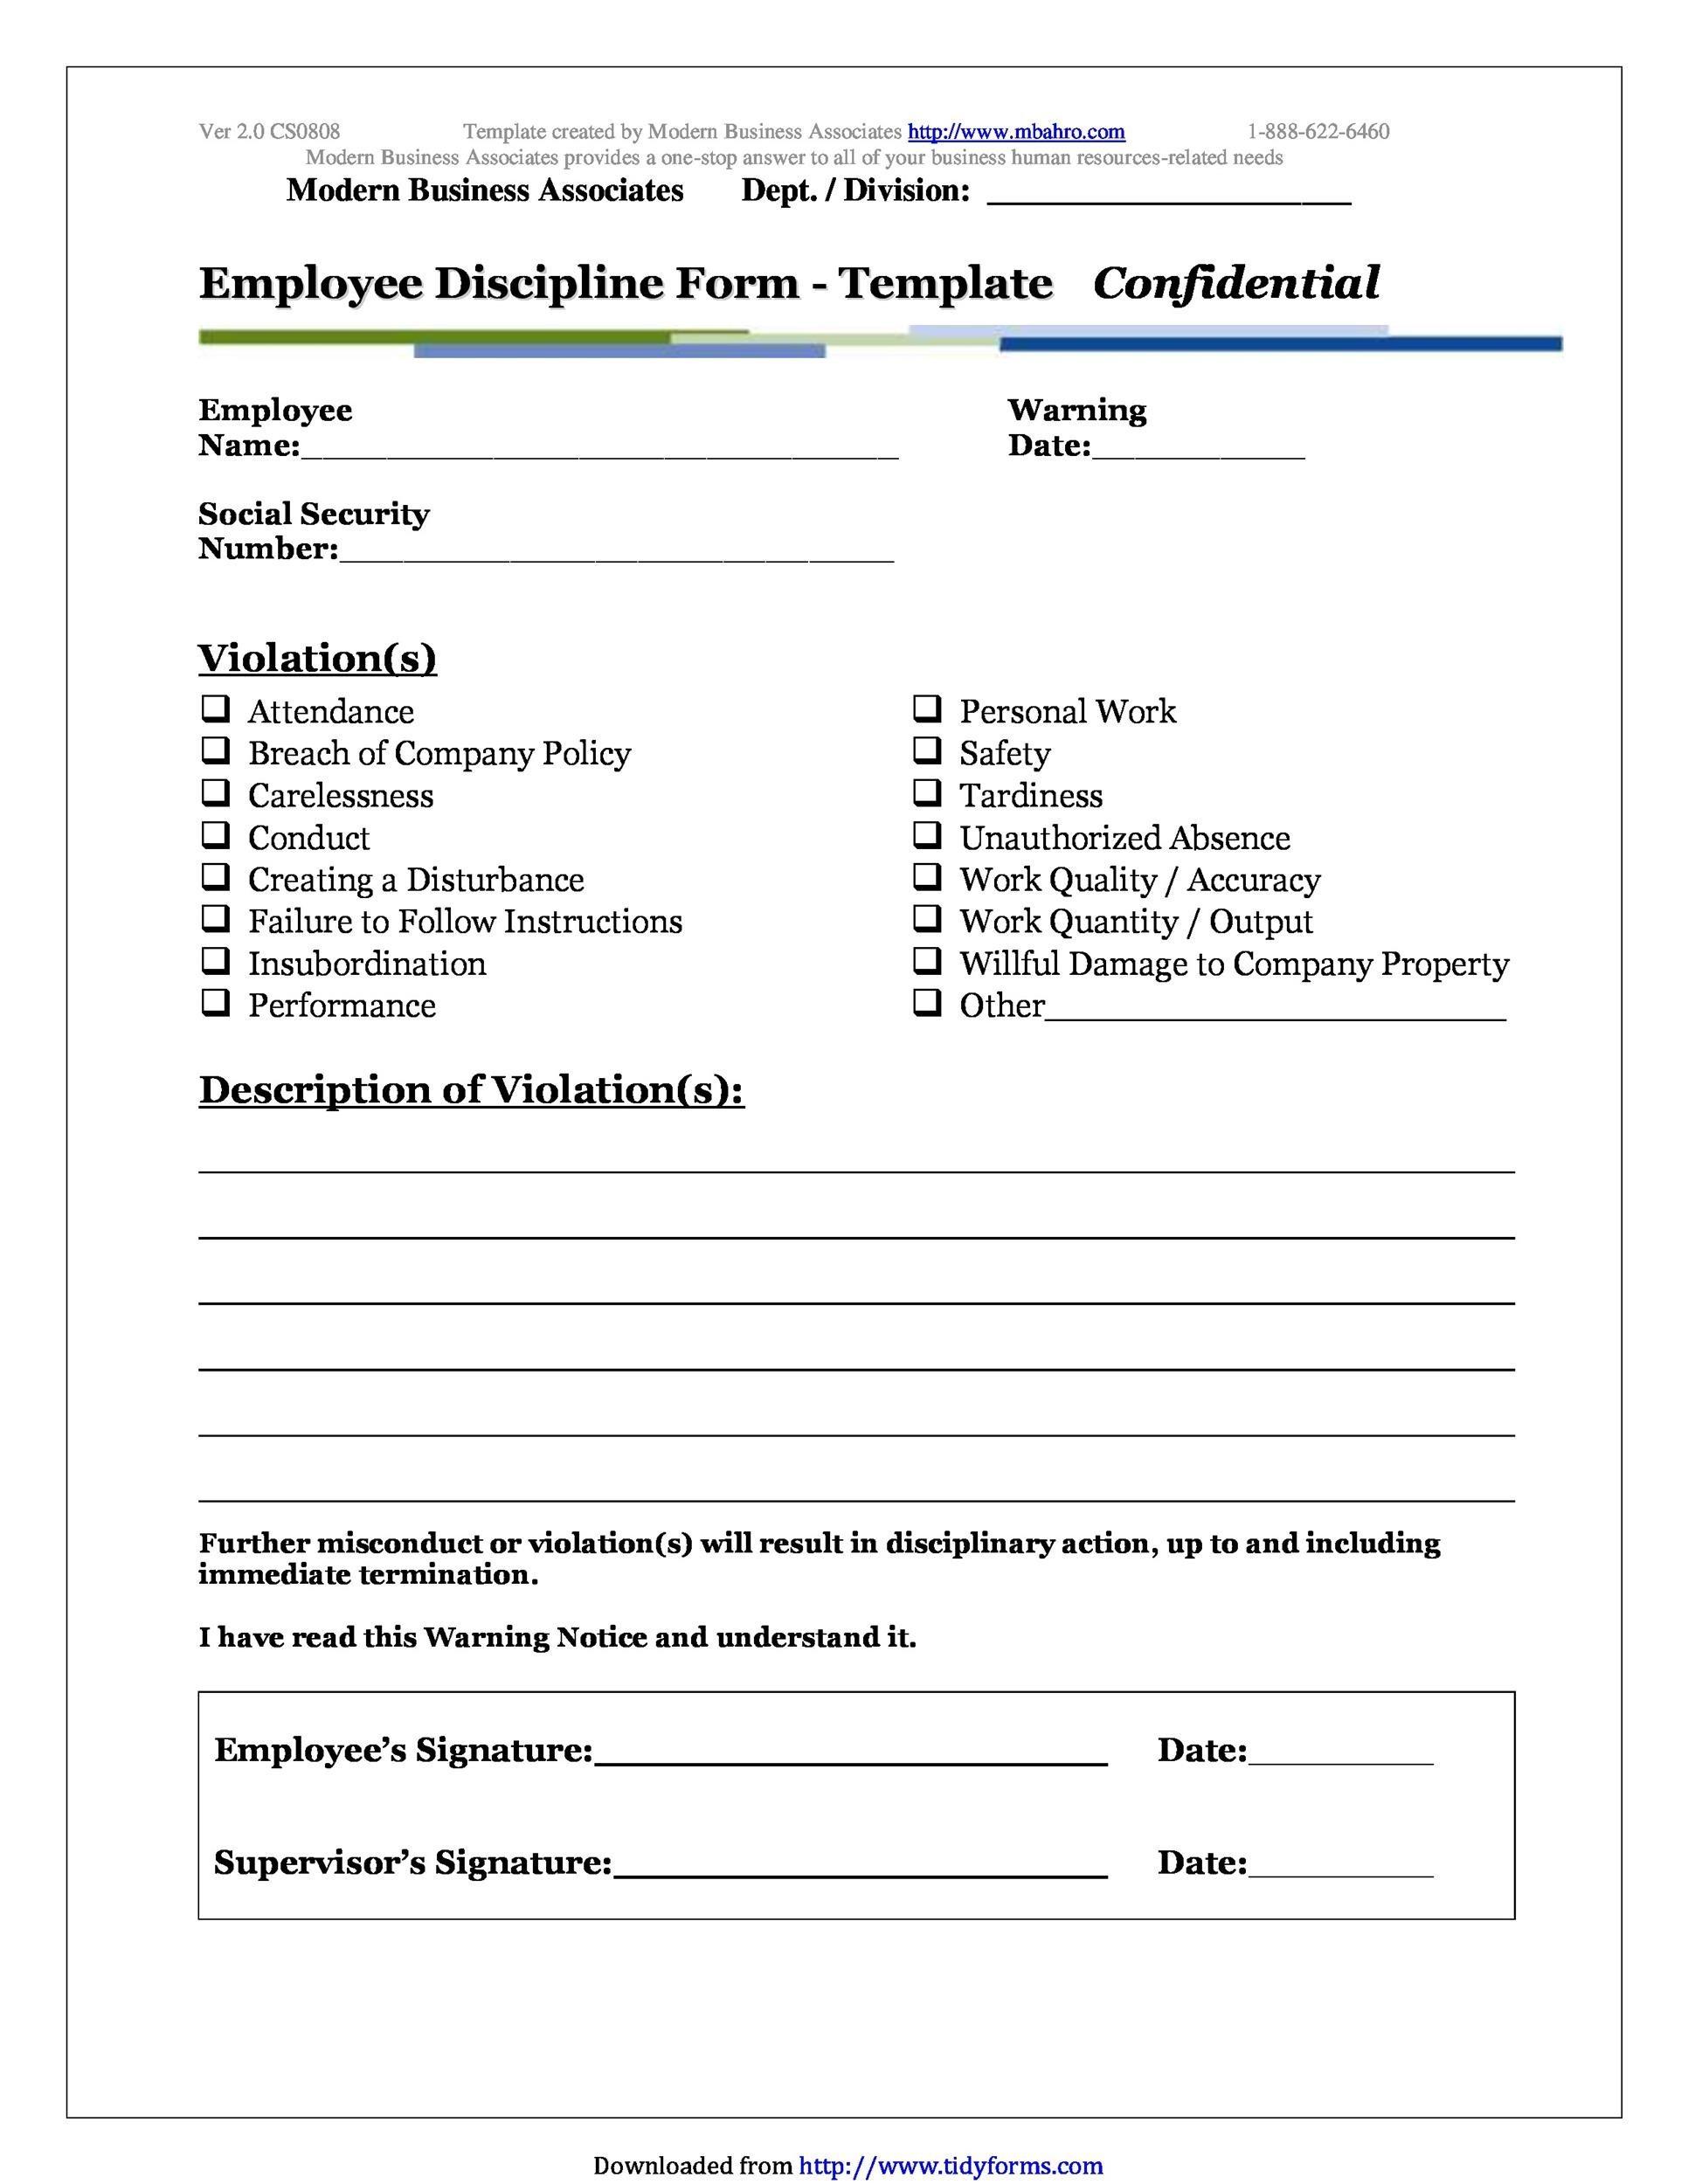 insubordination write up template